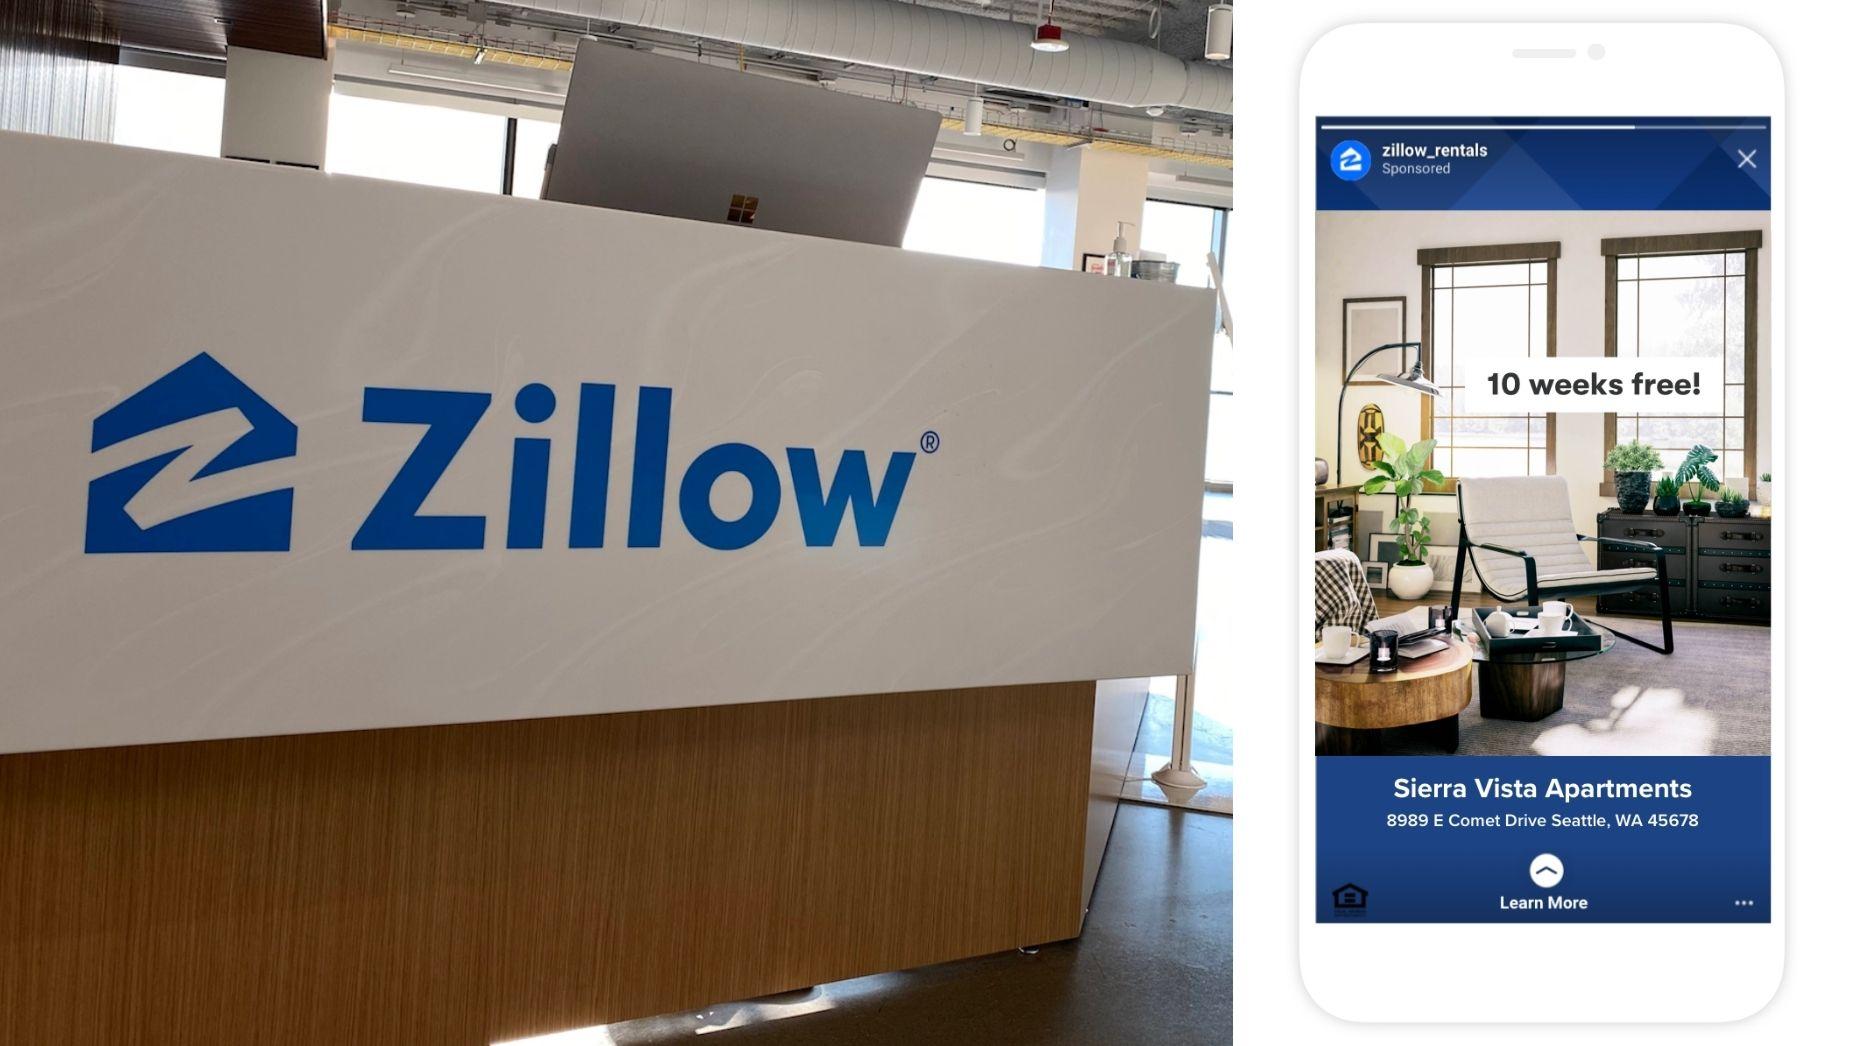 Zillow revamps its multi-family rental advertising platform